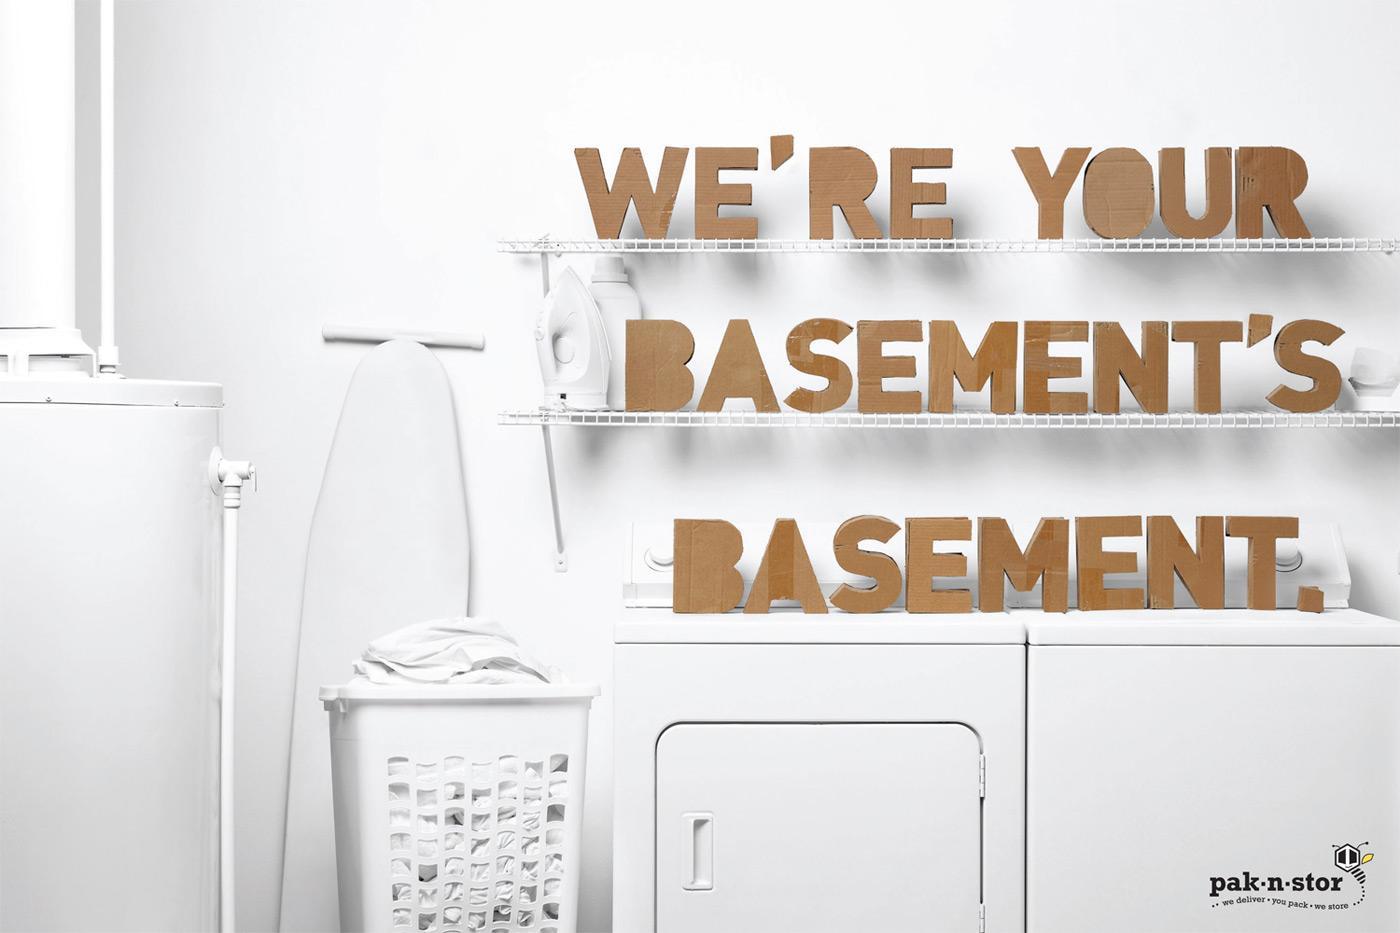 pak-n-stor Print Ad -  Basement